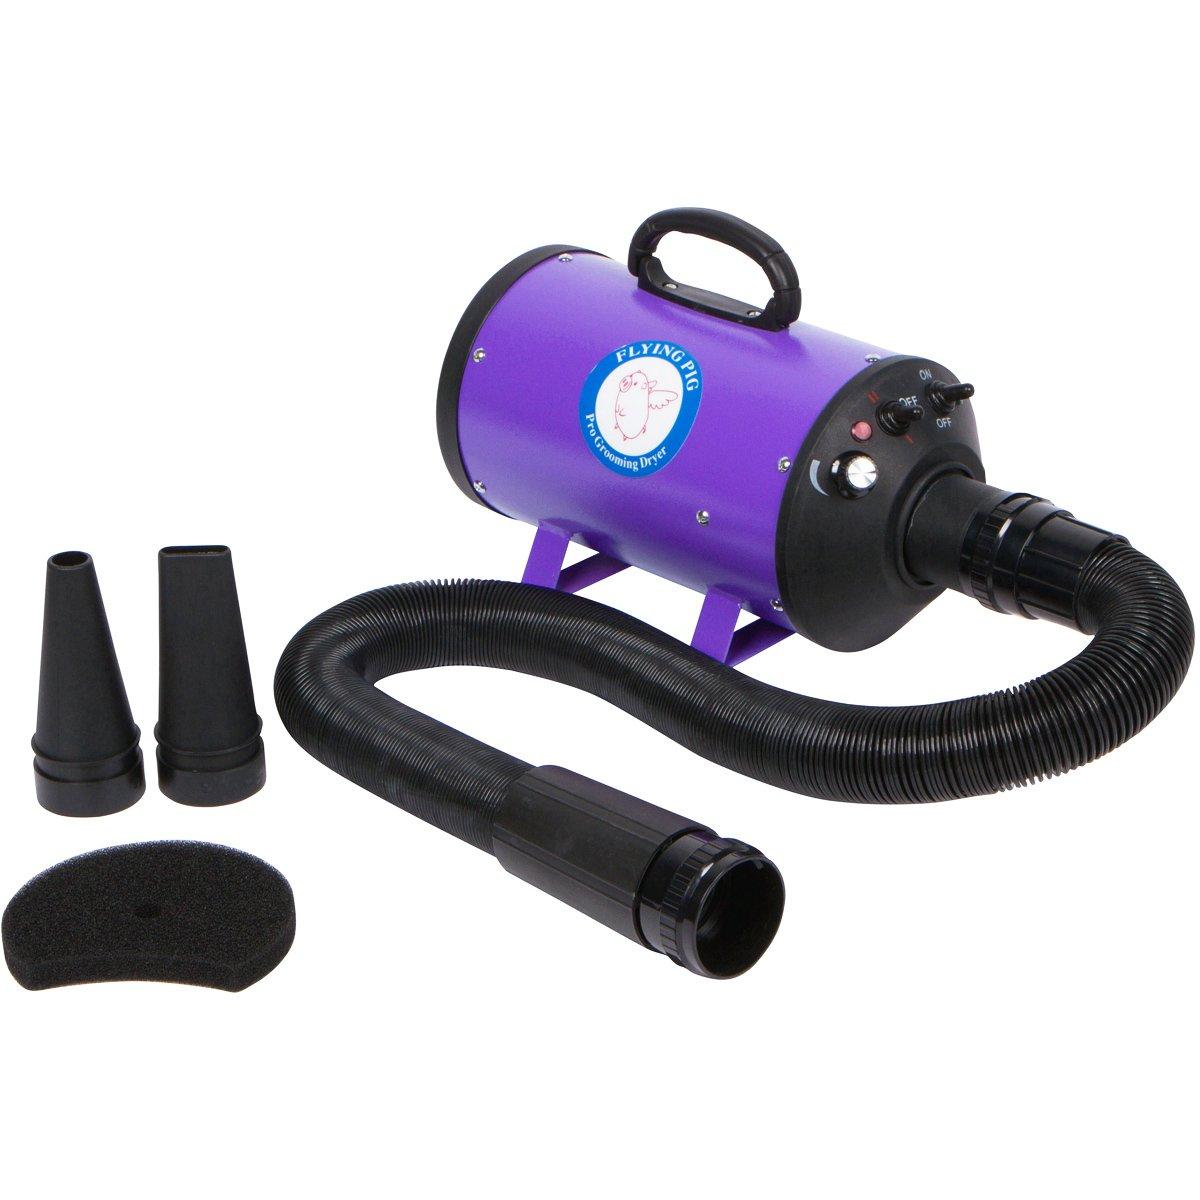 Flying Pig Grooming One Purple High Velocity 4.0 Hp Motor Dog Pet Grooming Force Dryer w/ Heater by Flying Pig Grooming